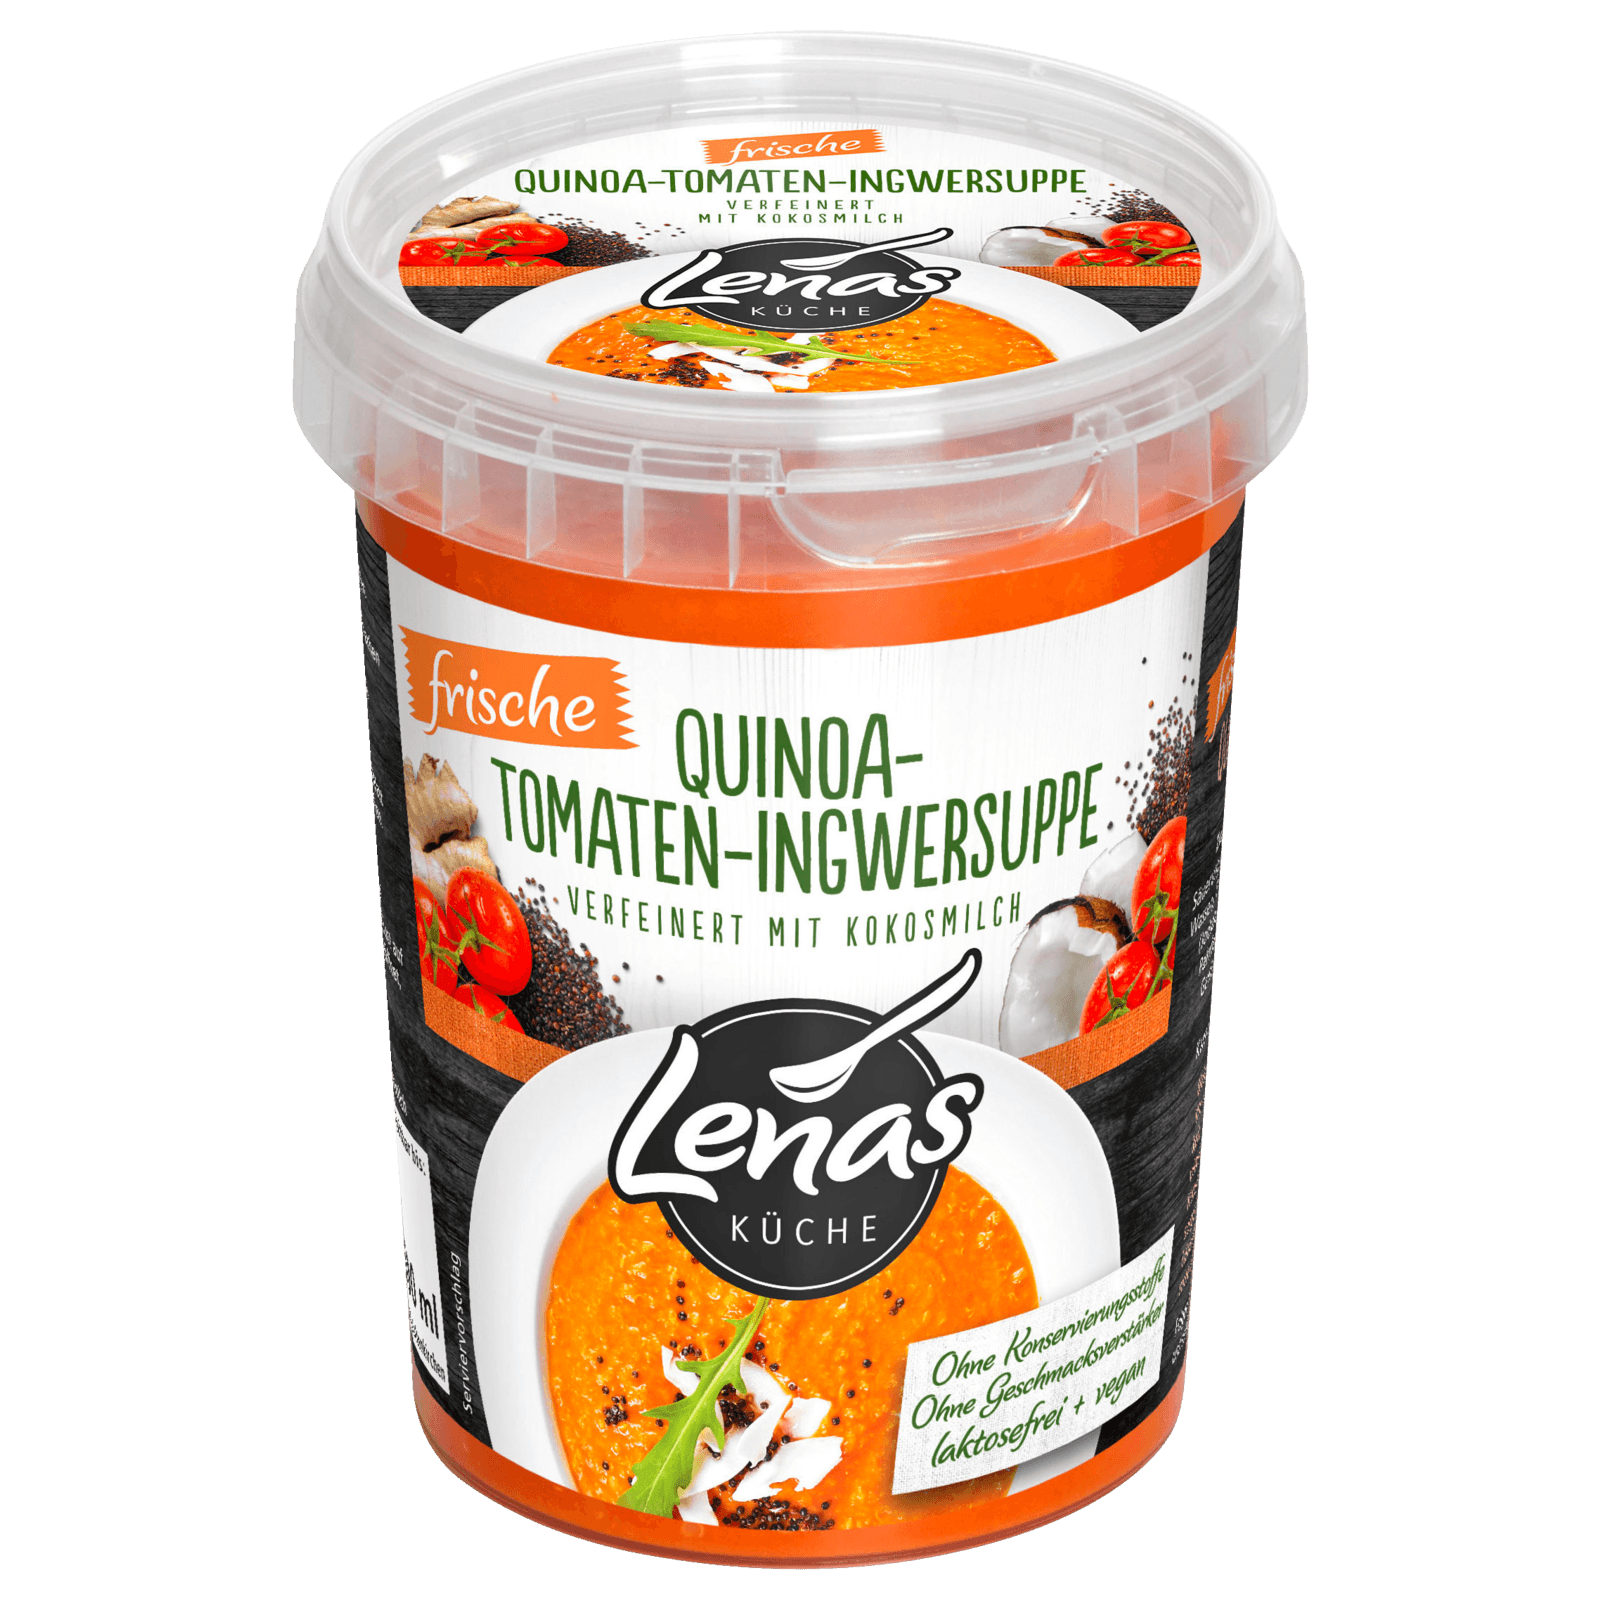 Lenas Küche Quinoa-Tomaten-Ingwer-Suppe 20g